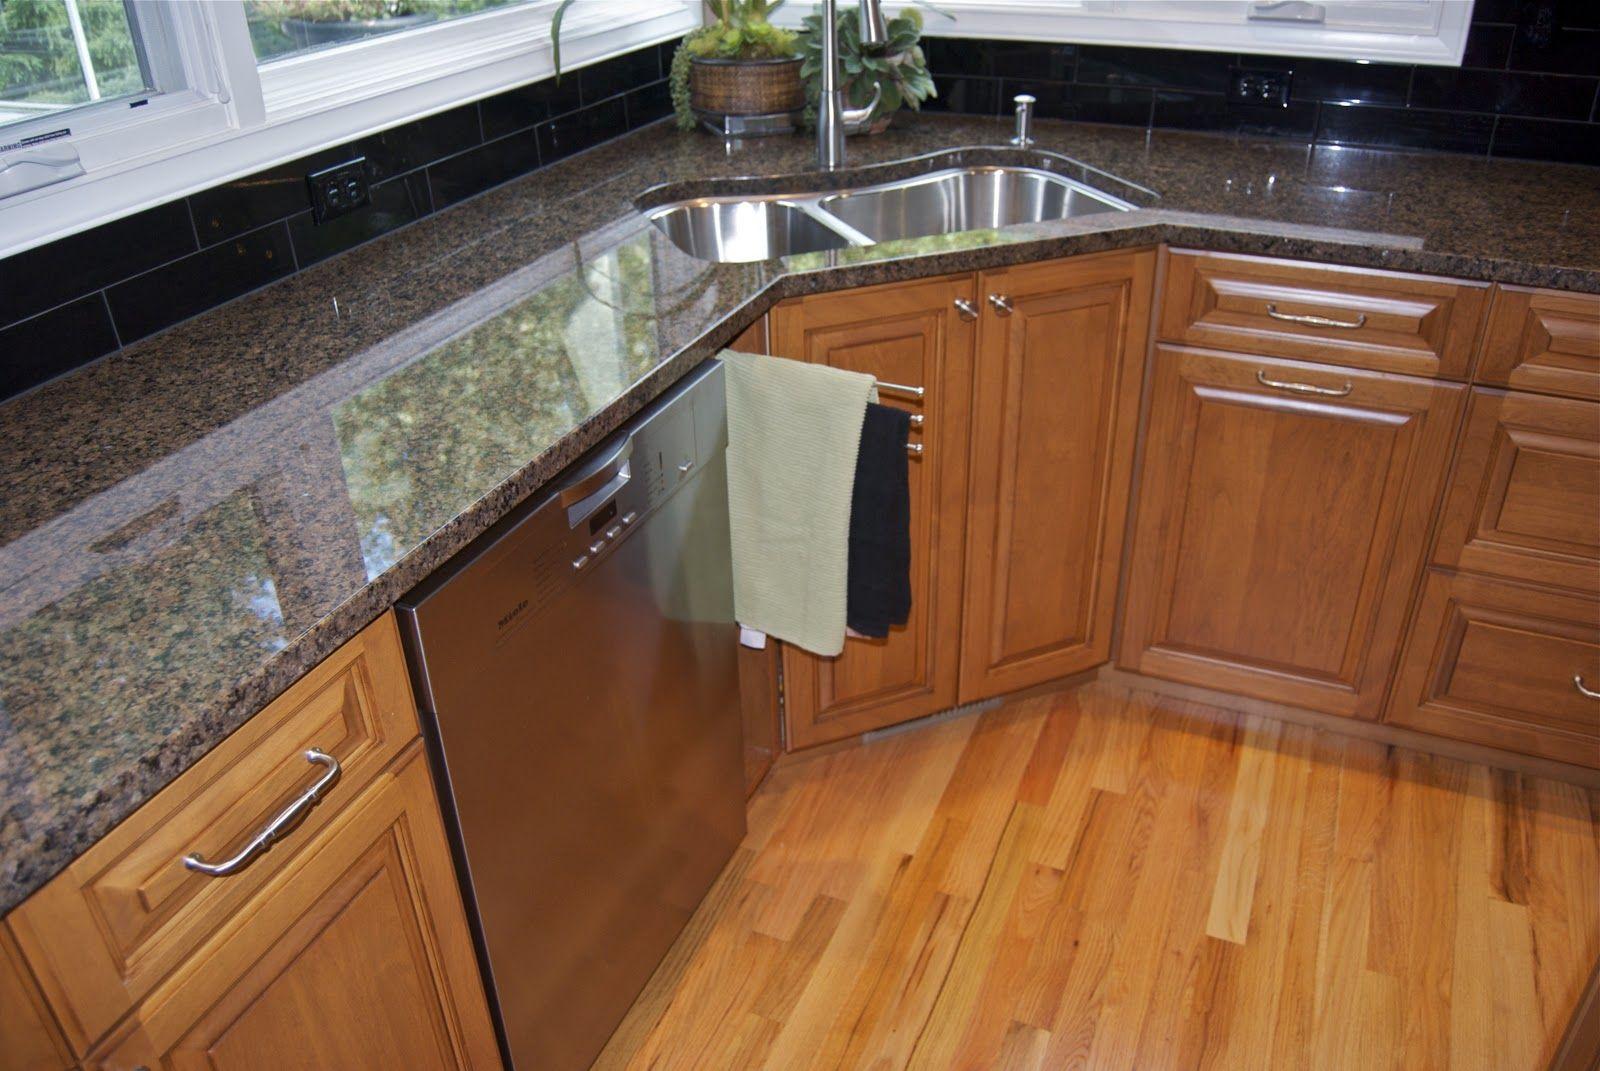 Rock Tops Provides Stylishly Designed Kitchens